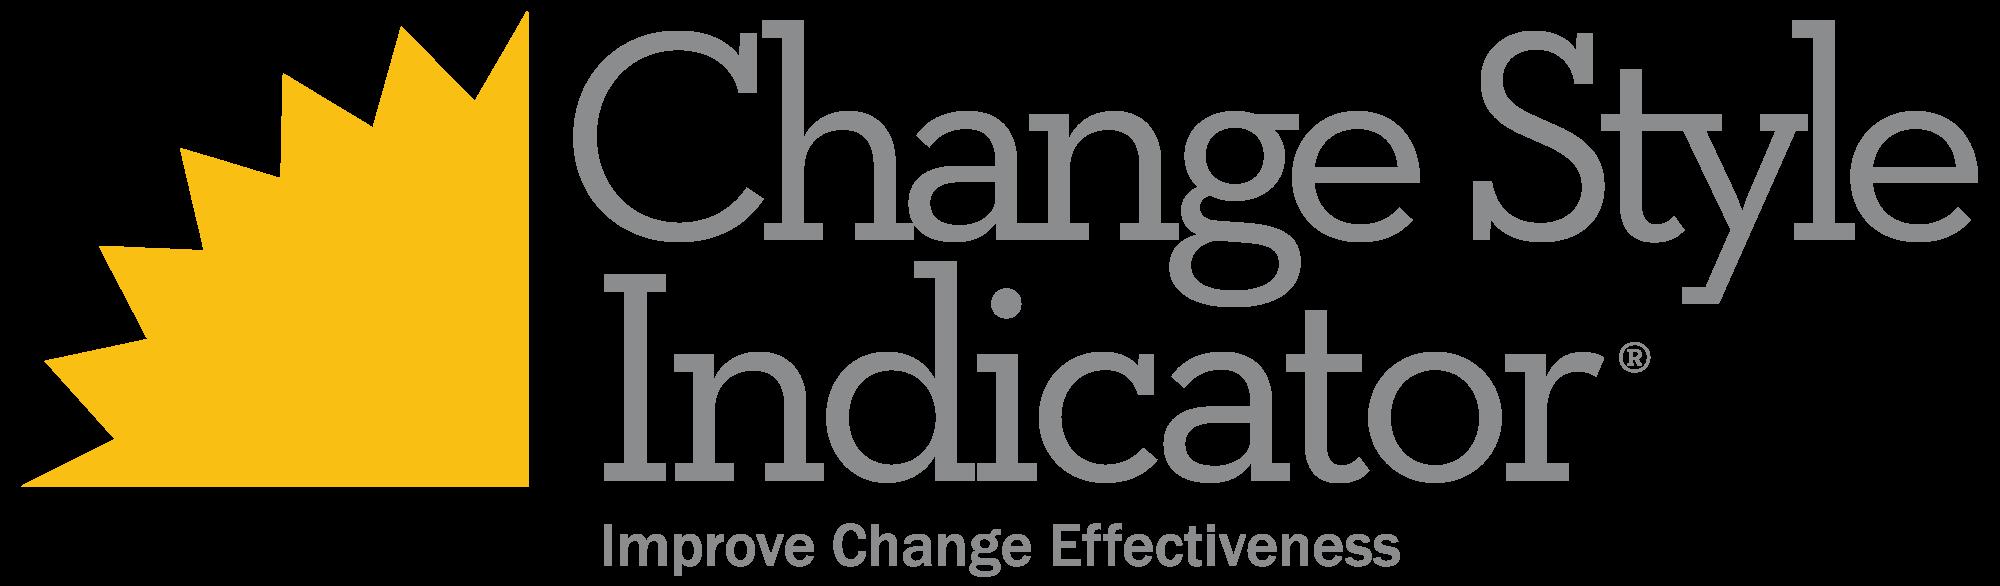 Change-Style-Indicator1